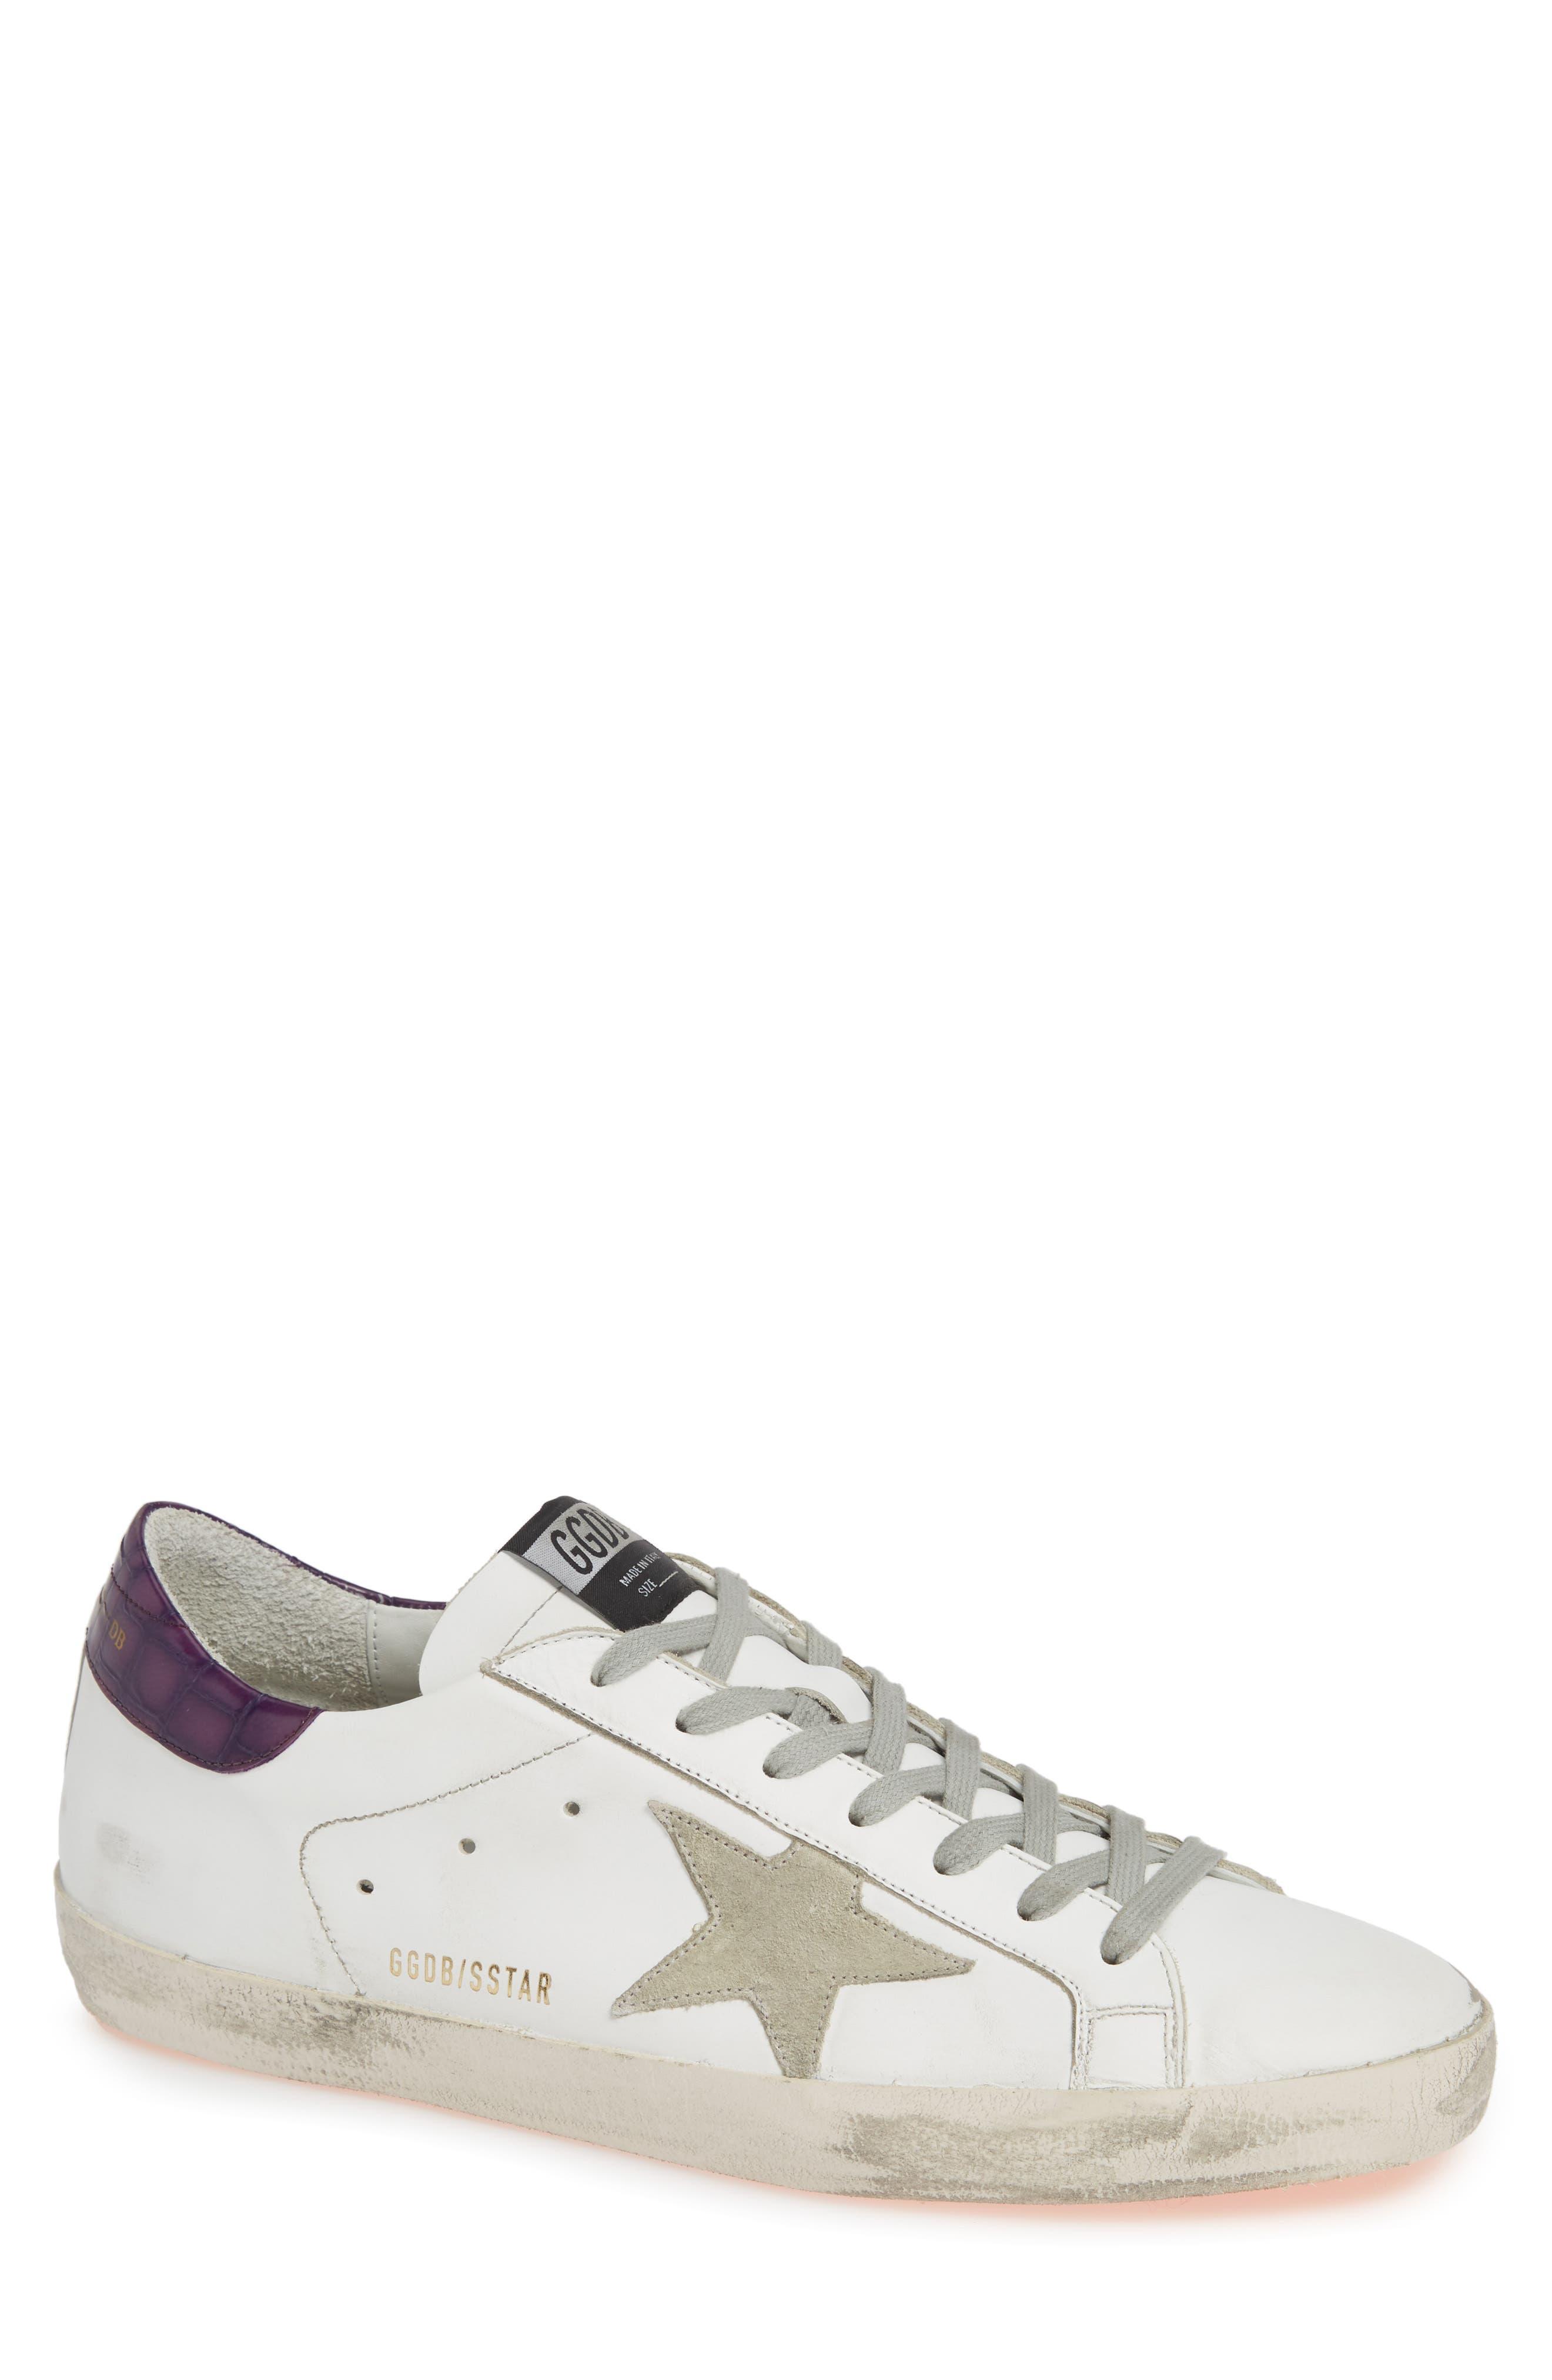 GOLDEN GOOSE,                             'Superstar' Sneaker,                             Main thumbnail 1, color,                             WHITE/ VIOLET